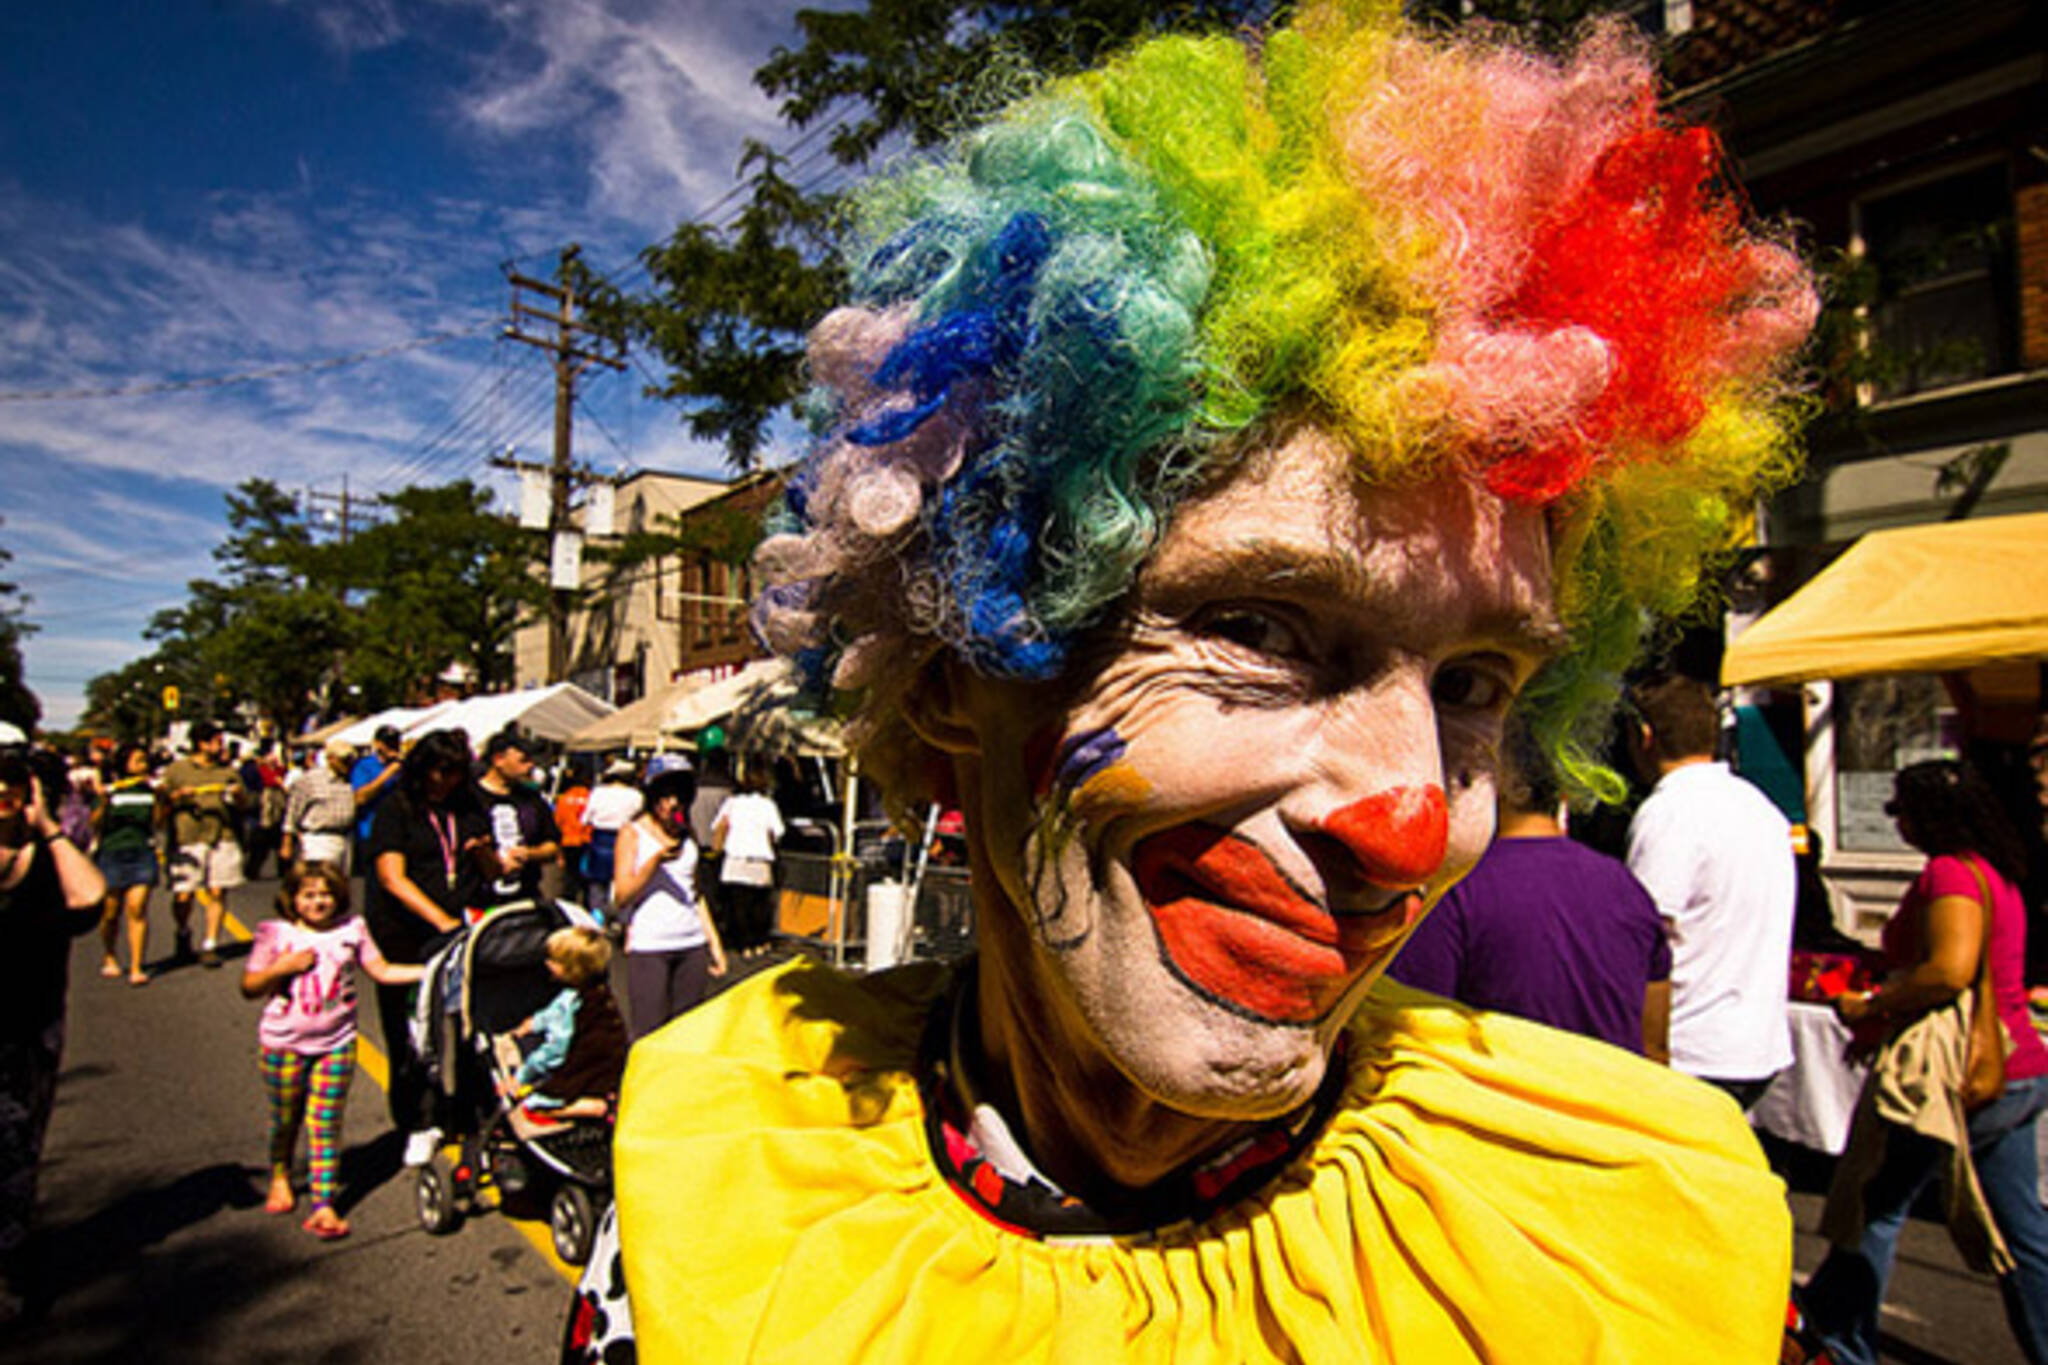 clown, kensington, sunday